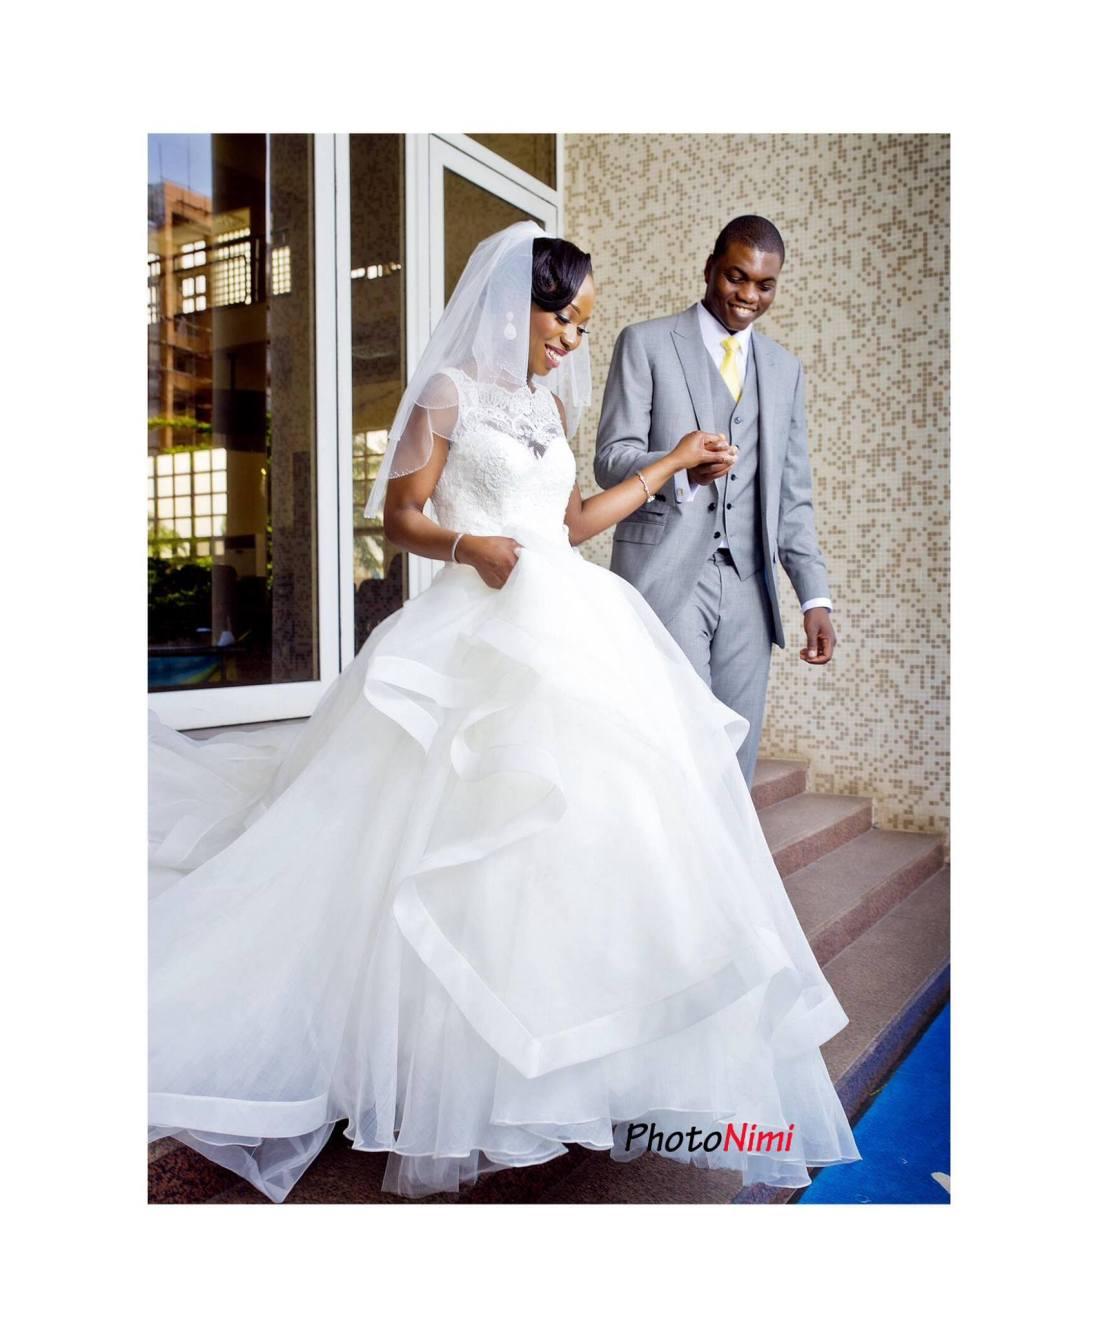 Mope and Niyi joyful after their church wedding